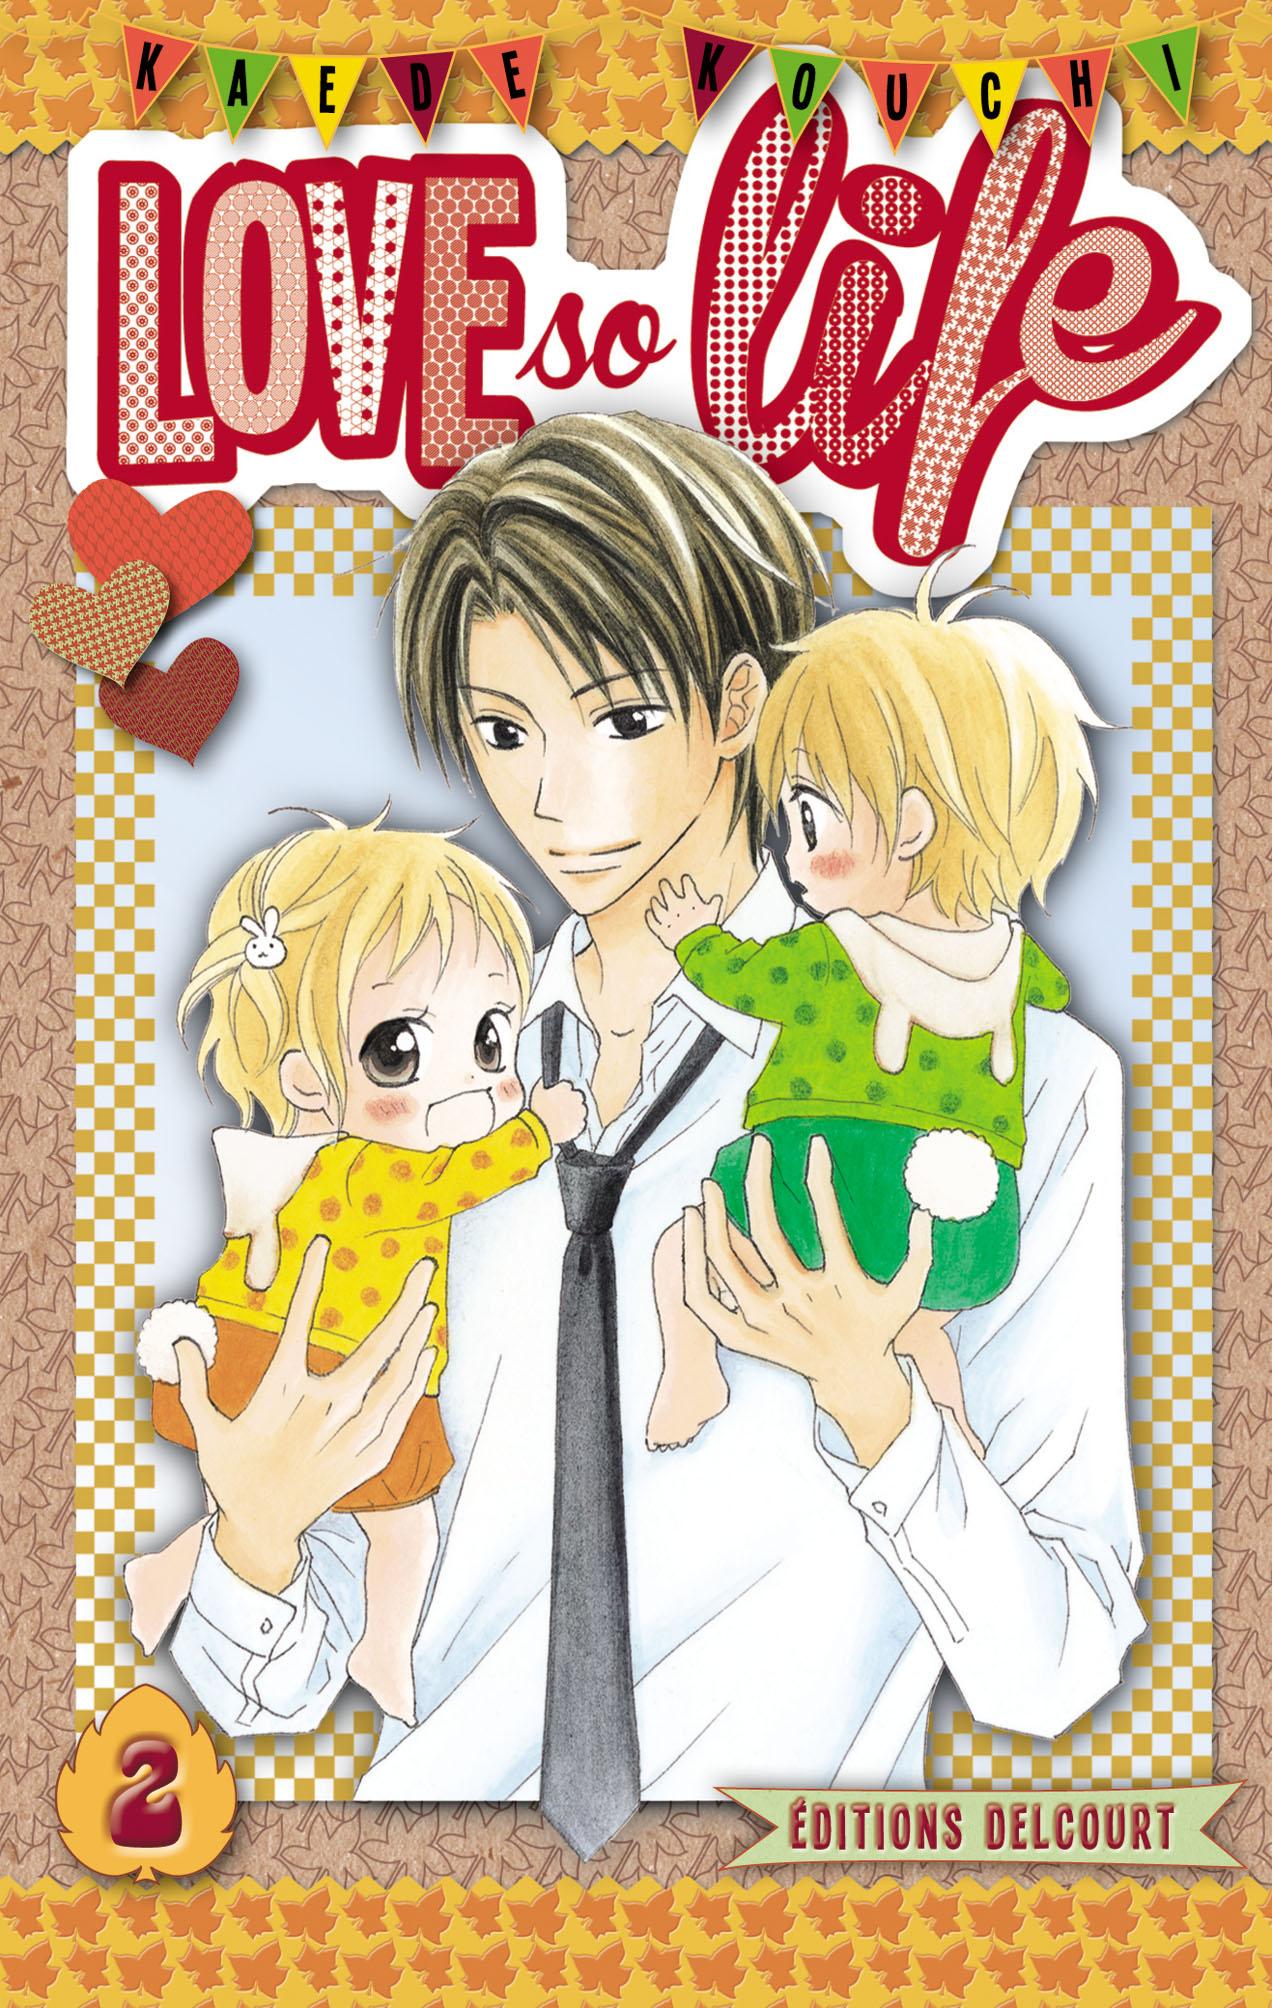 http://img.manga-sanctuary.com/big/love-so-life-manga-volume-2-simple-61514.jpg